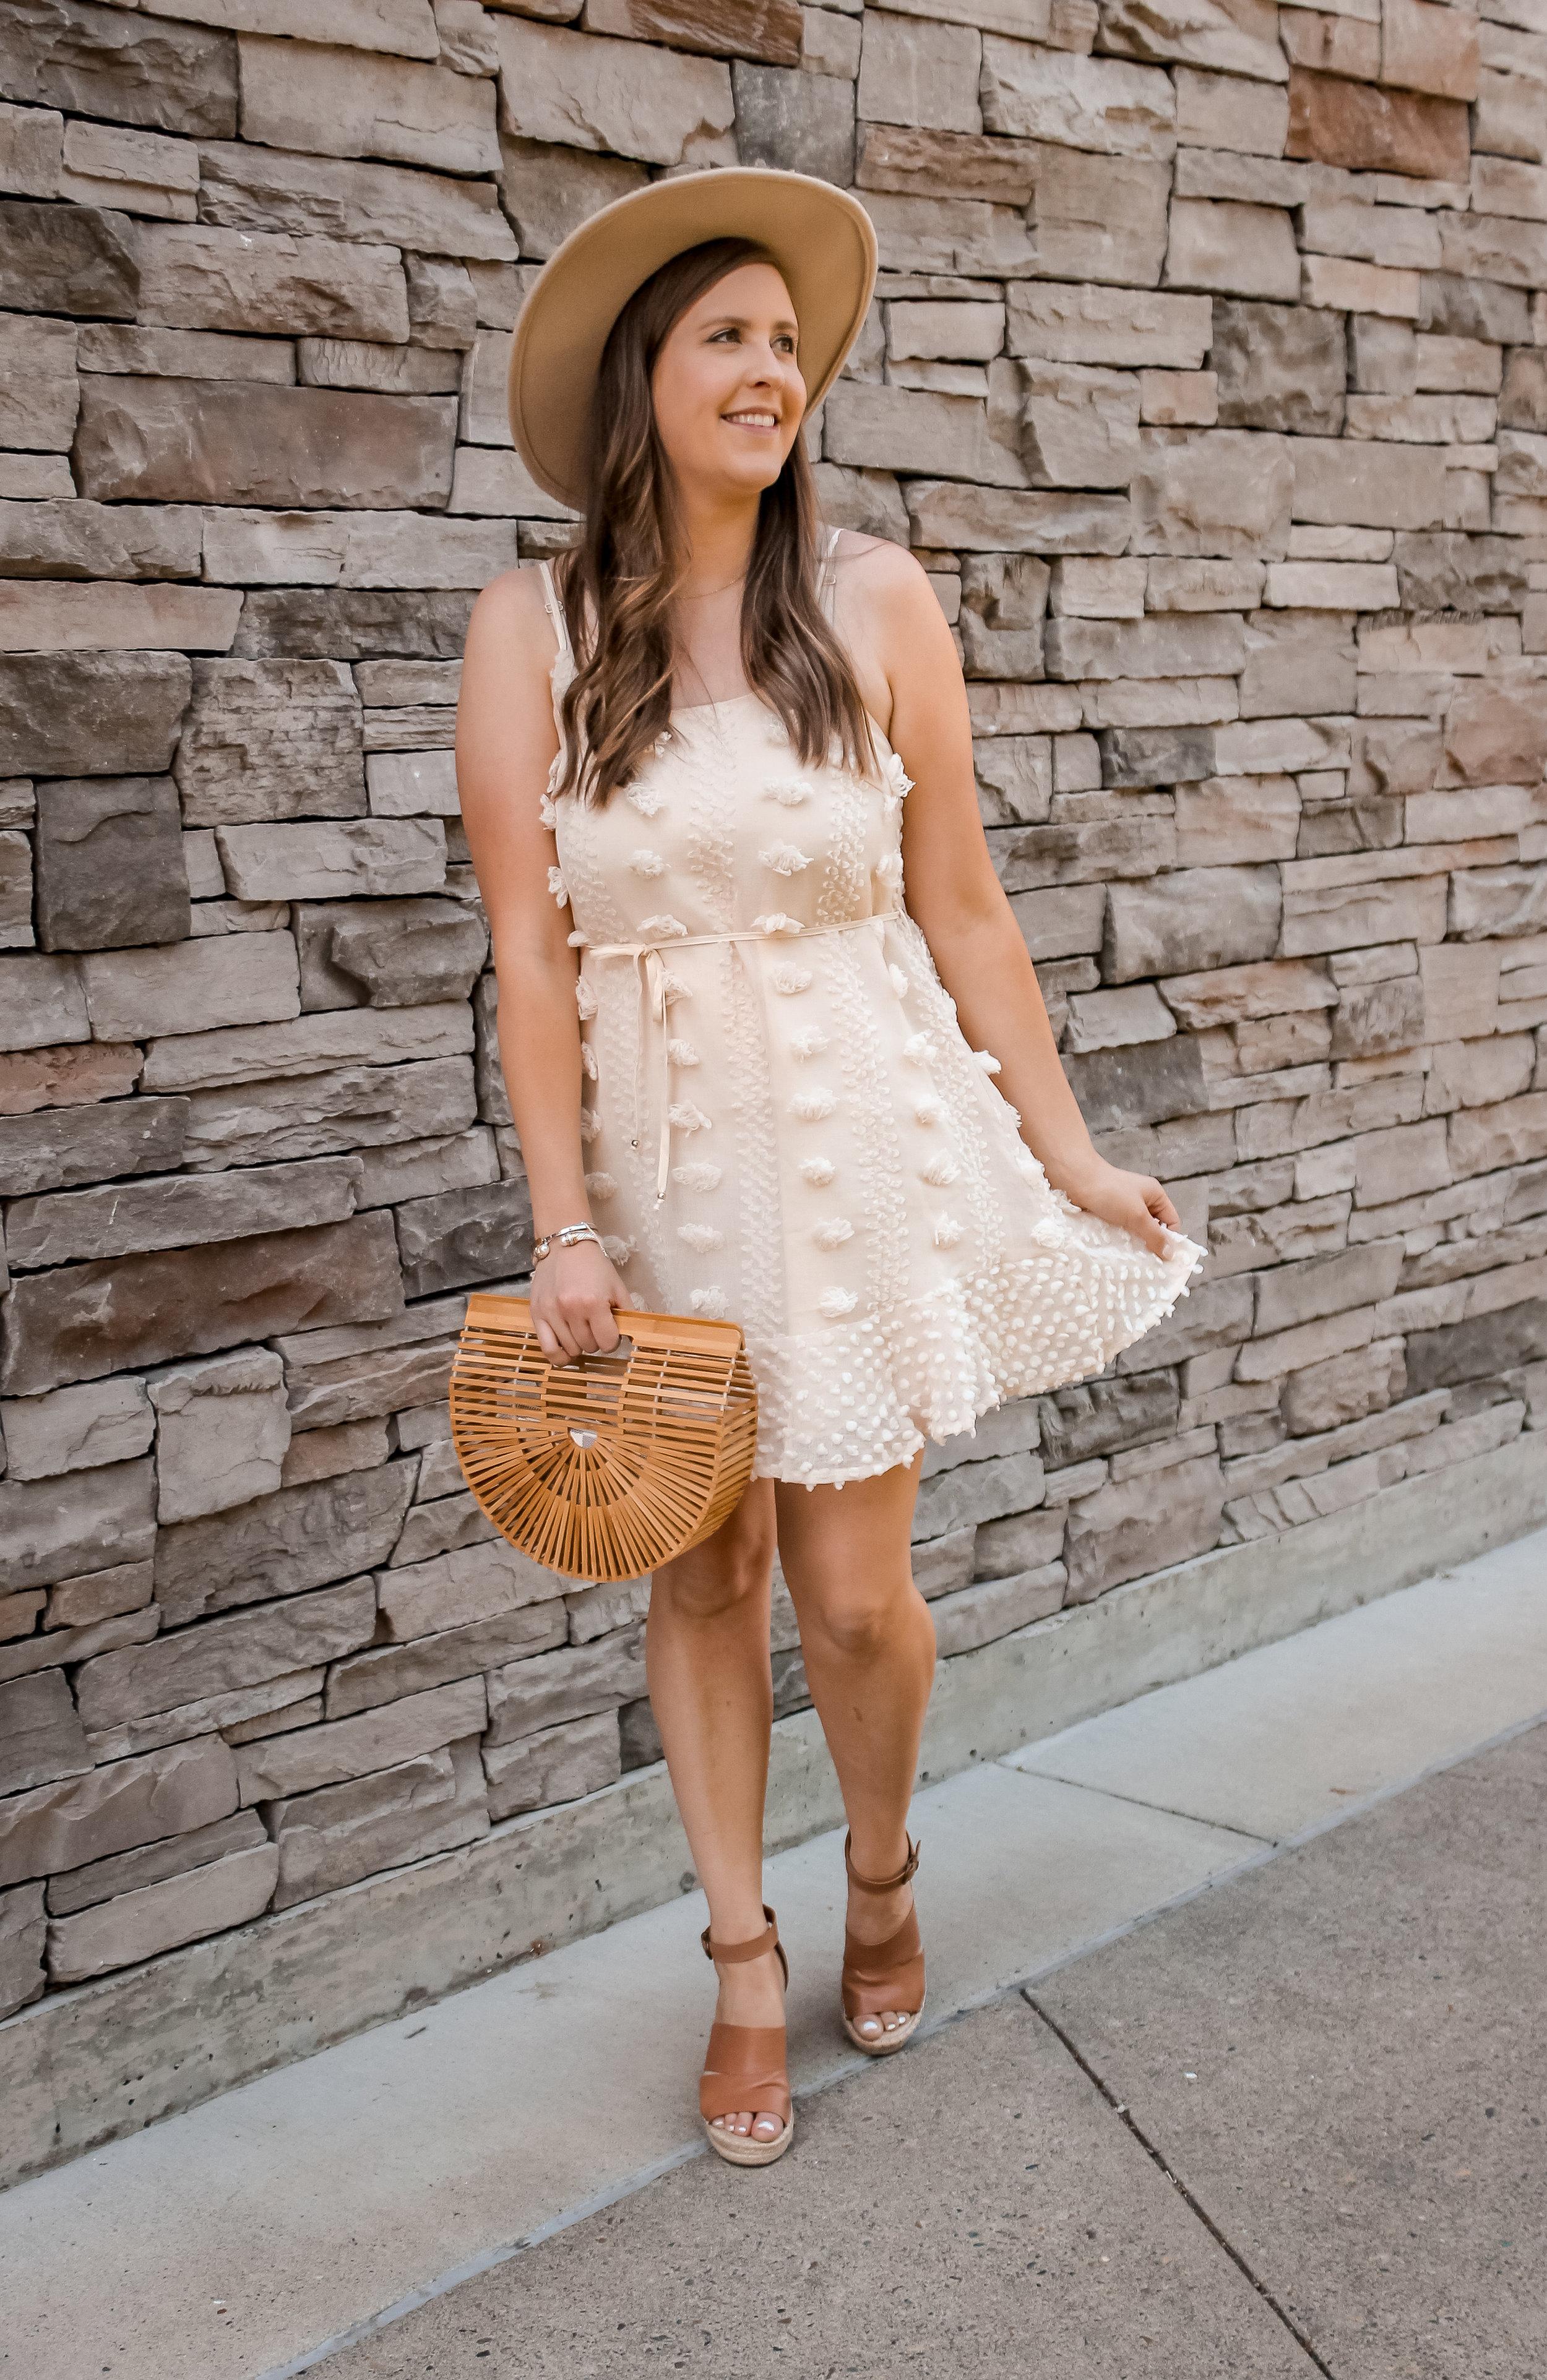 Cream Colored Event Dress